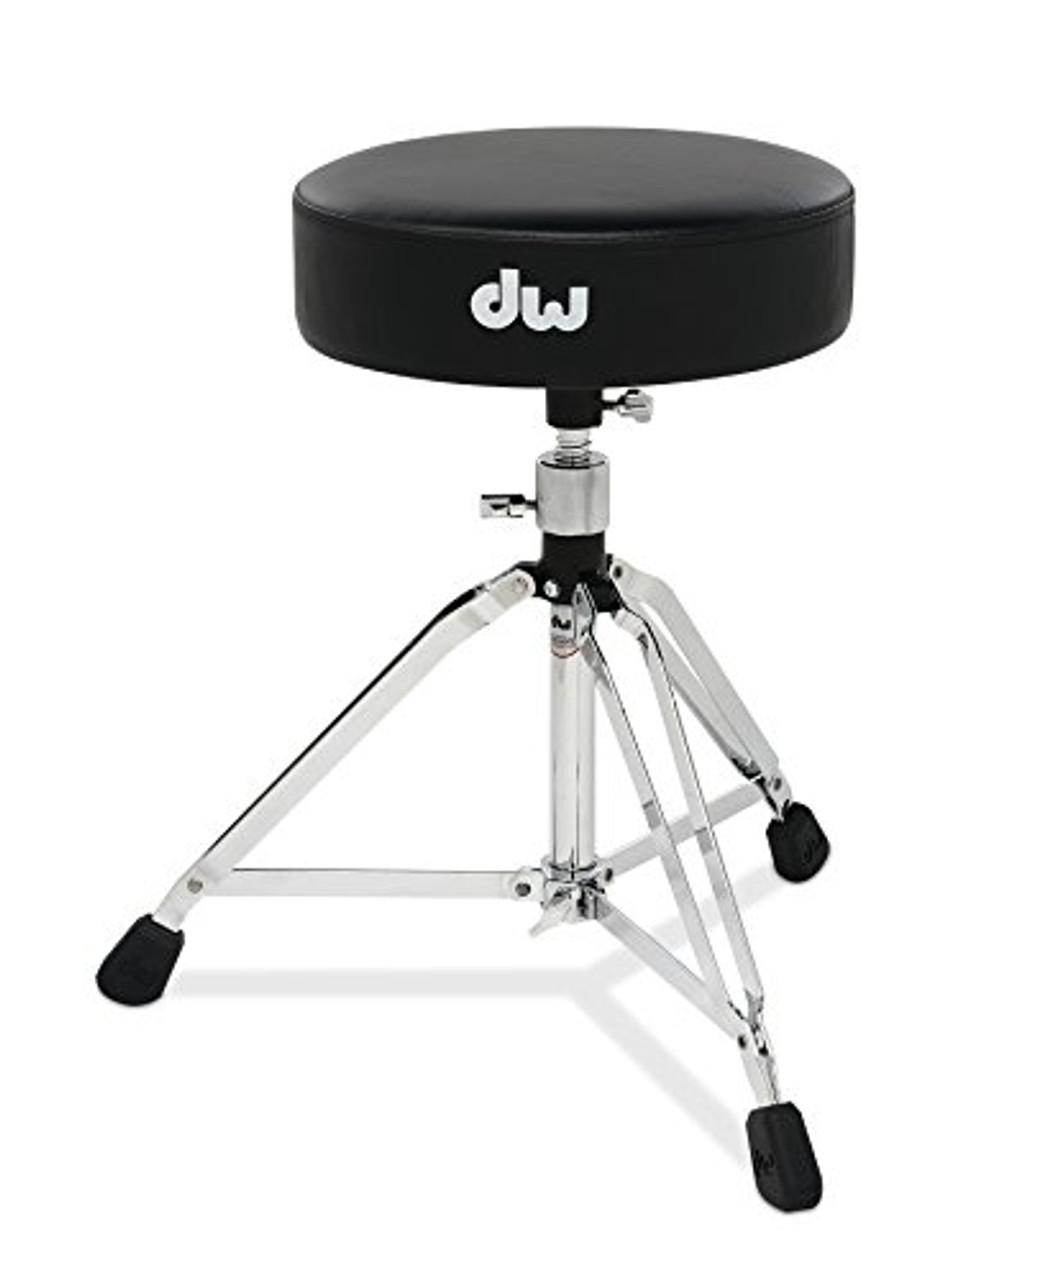 Drum Workshop 5000 Series Throne with Oversized Nut